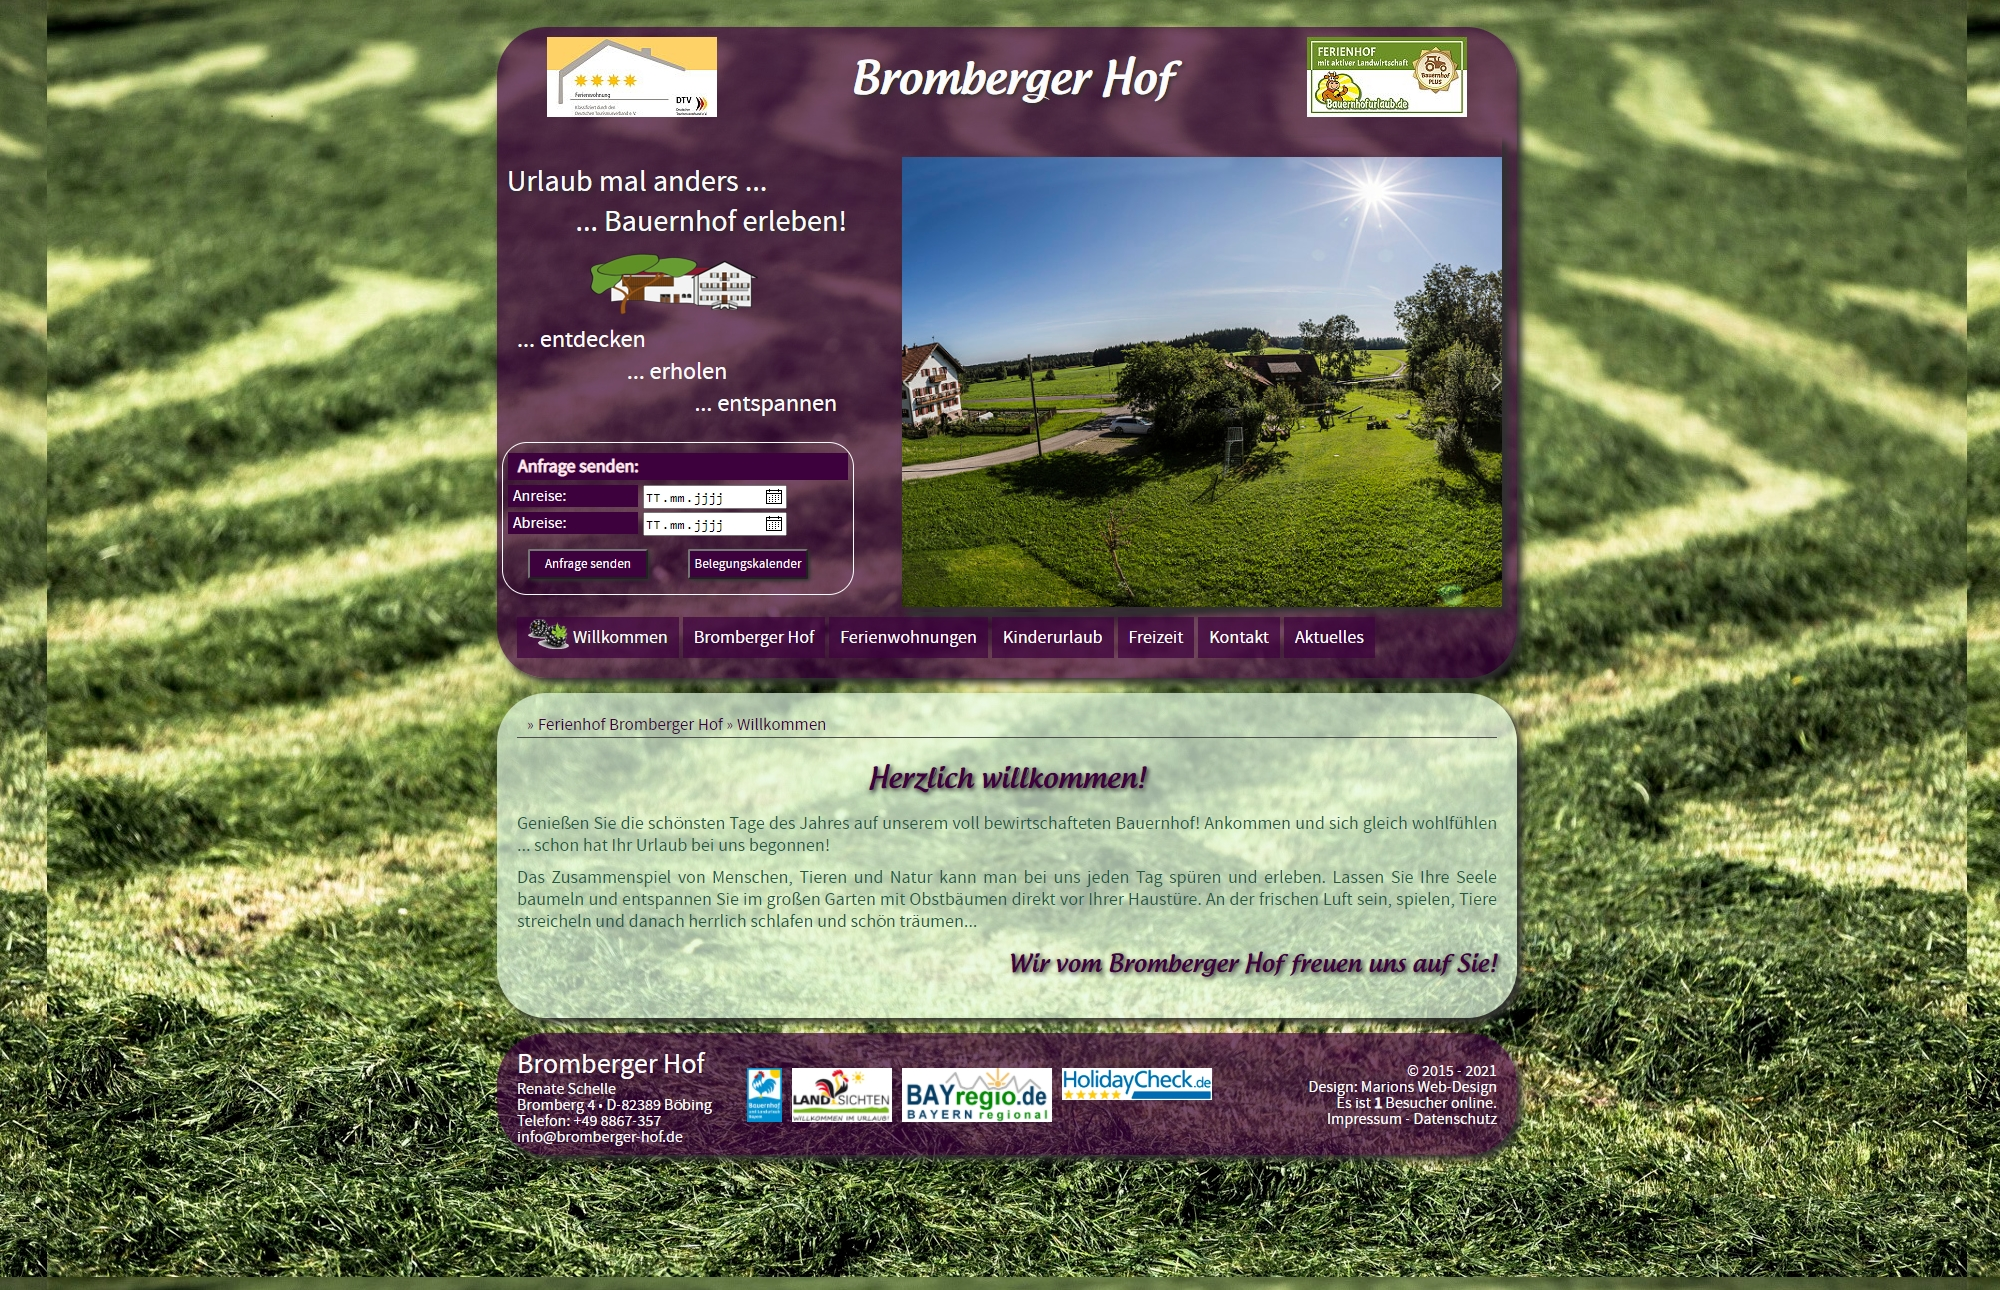 Bromberger Hof